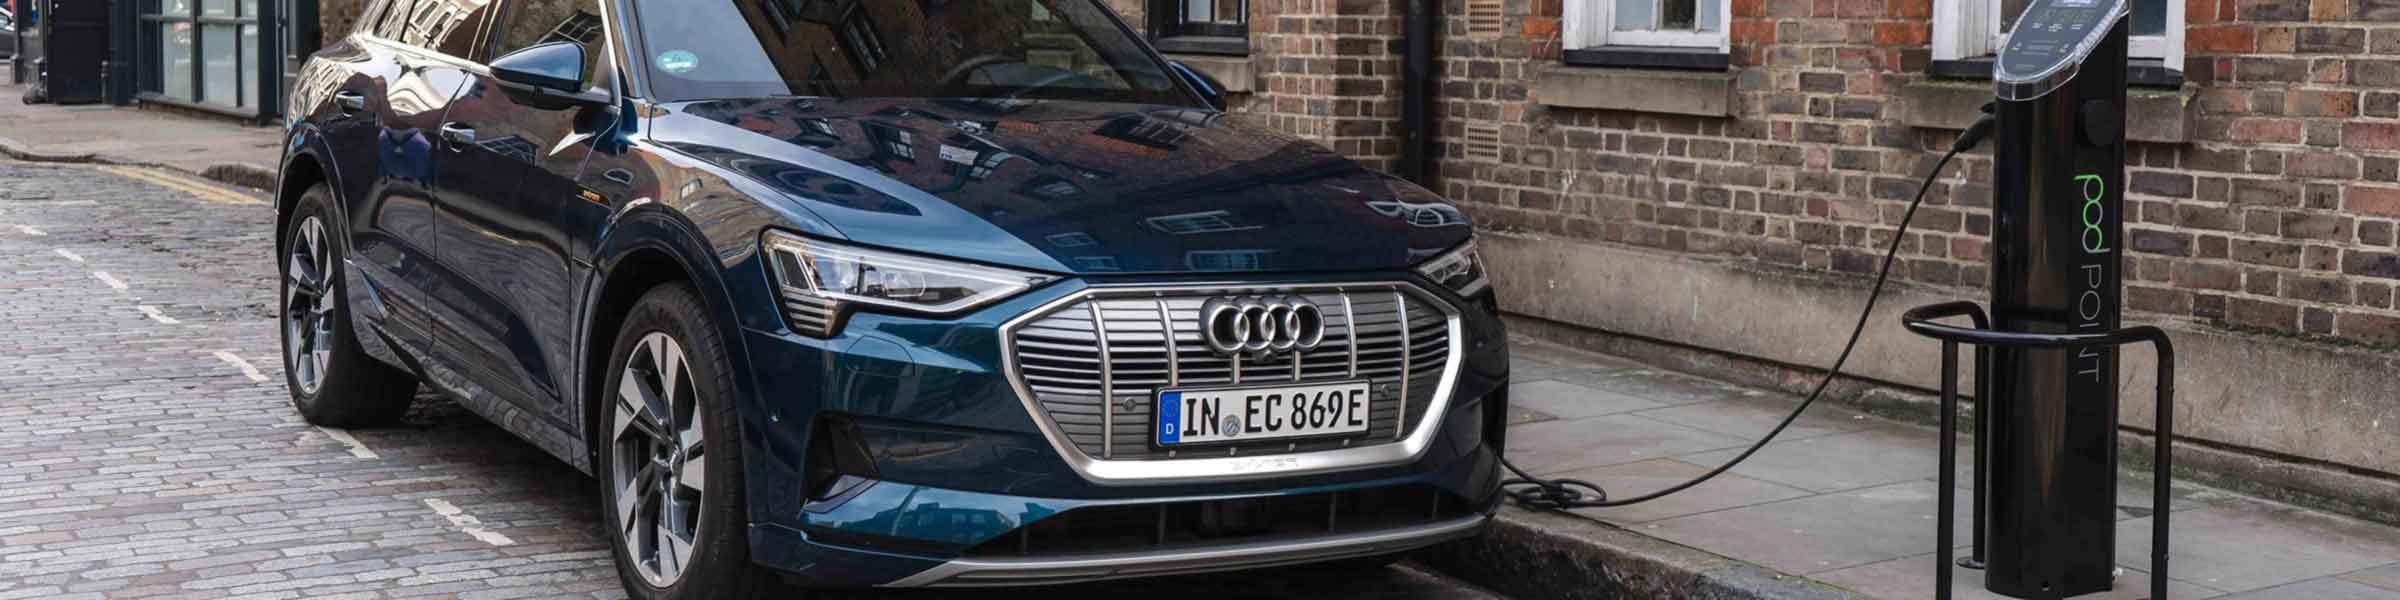 Audi E Tron Parked Blog Header